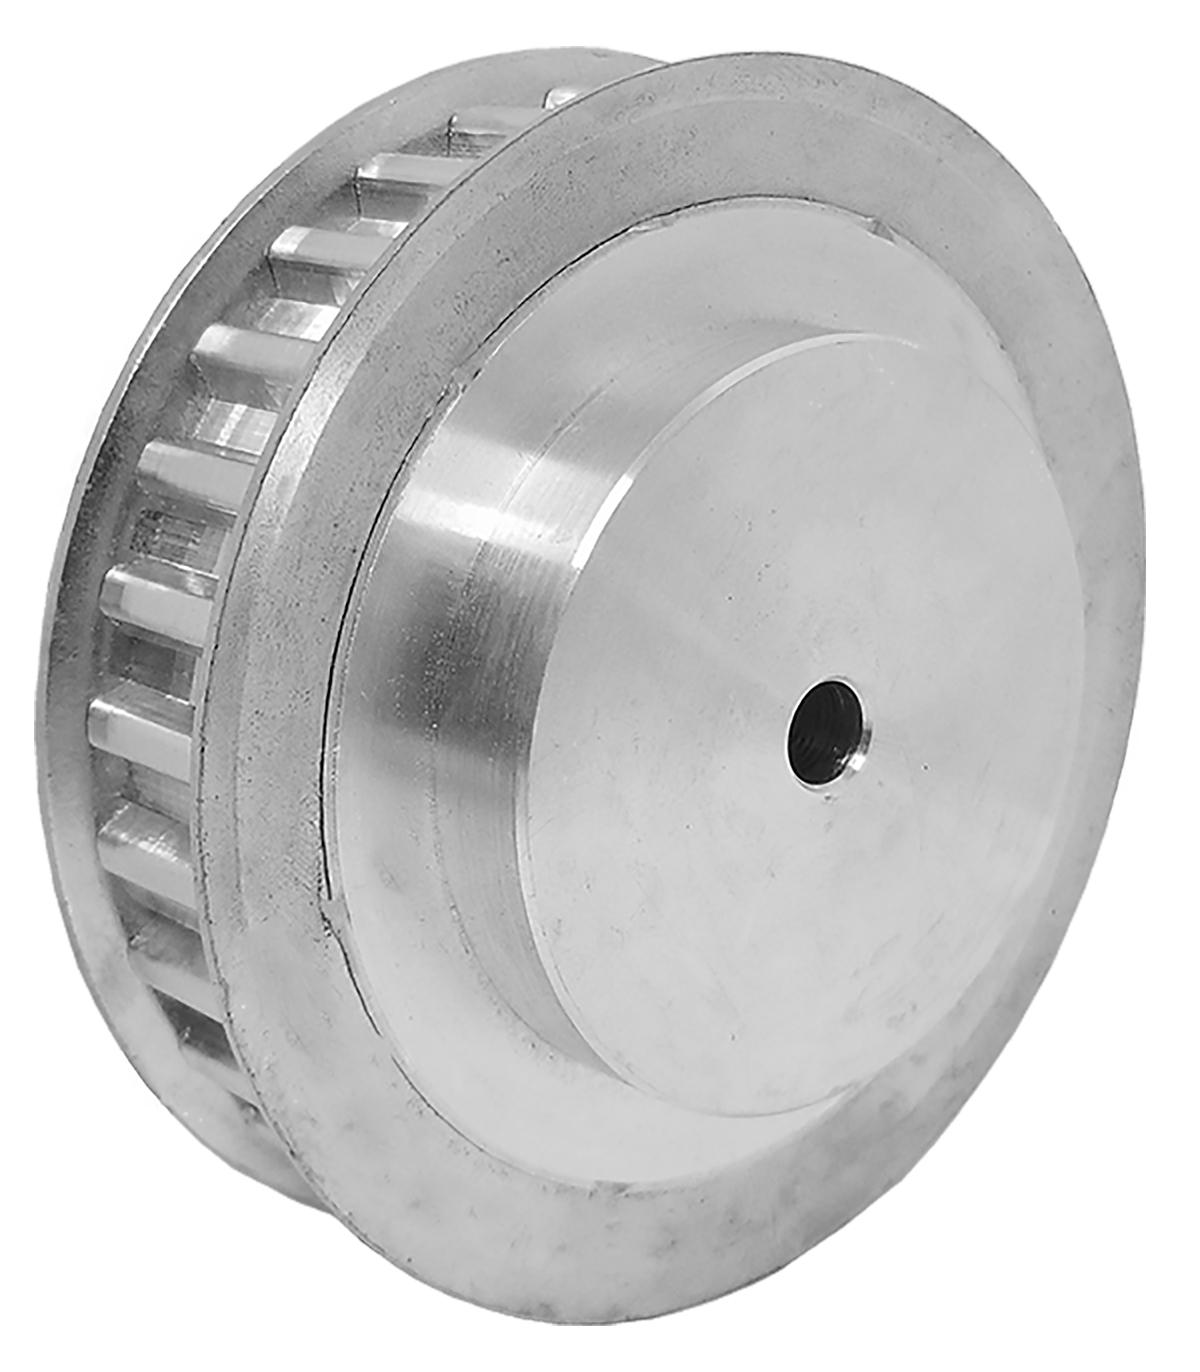 31T10/30-2 - Aluminum Metric Pulleys